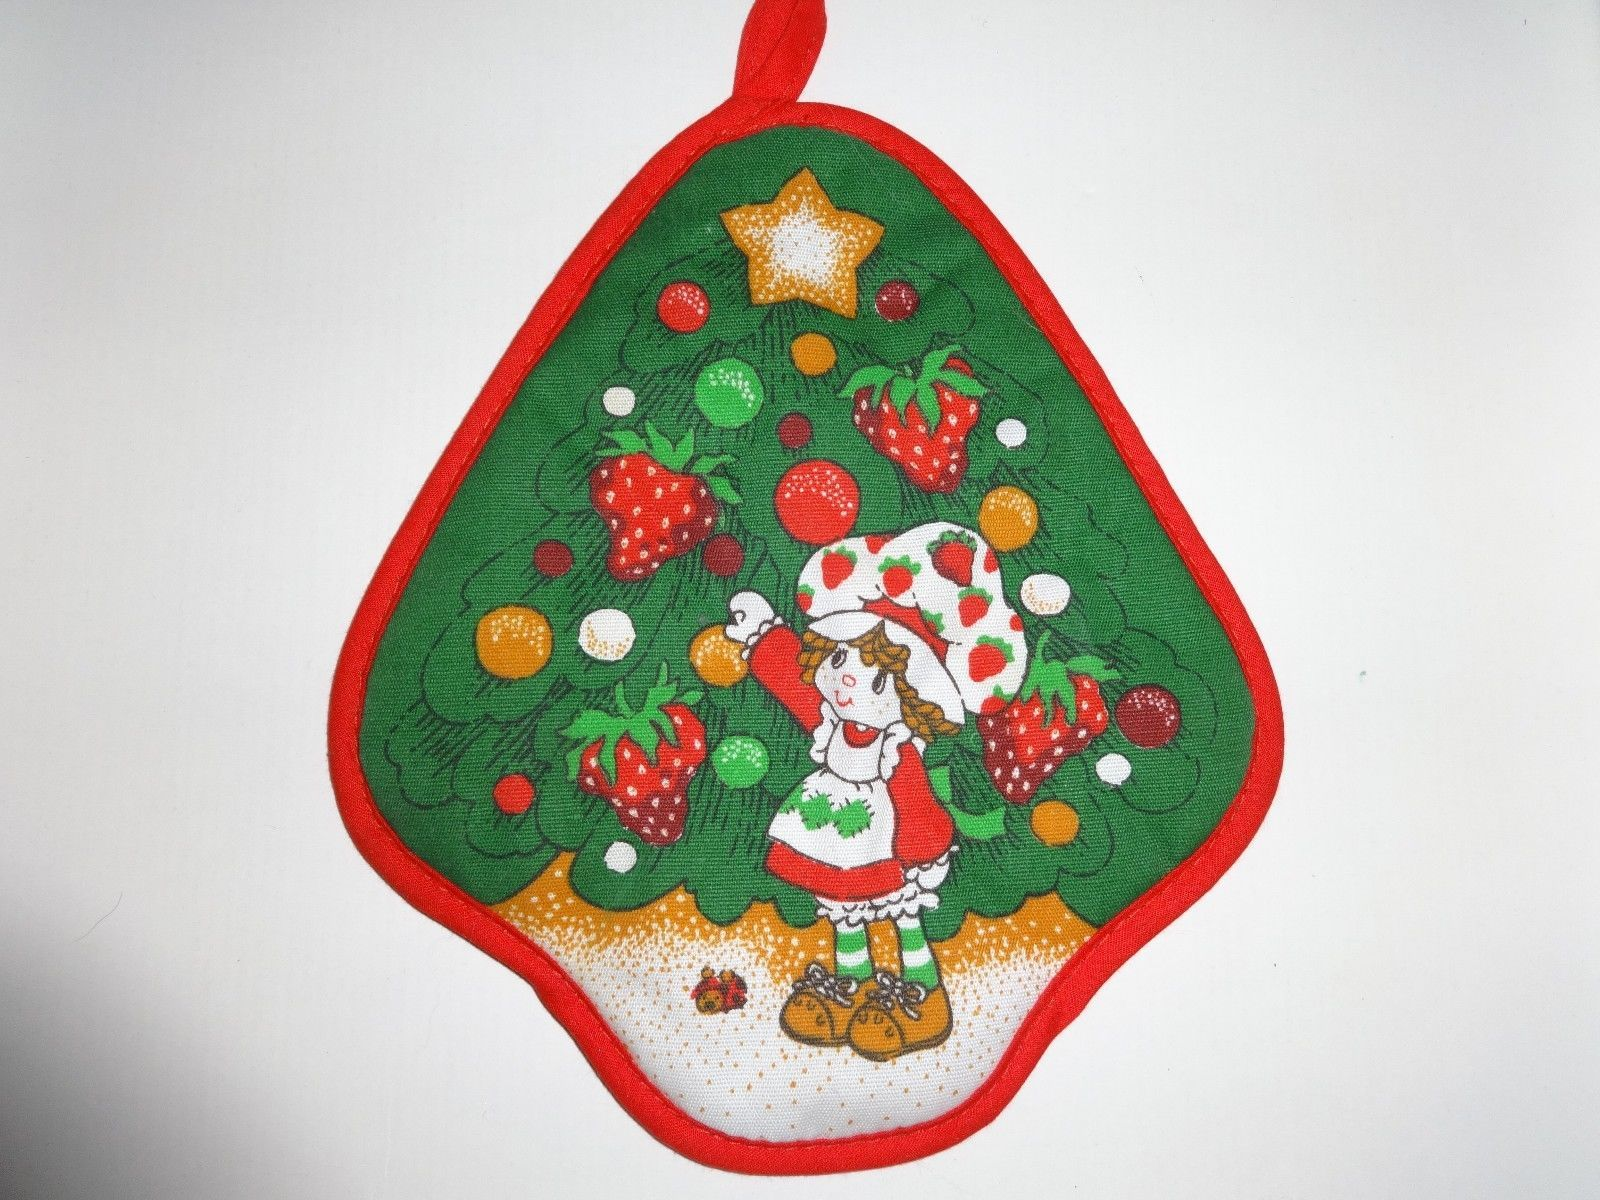 http://www.ebay.com/itm/STRAWBERRY-SHORTCAKE-Hot-Pad-VINTAGE-CHRISTMAS-1980-Pot-Holder-new-condition-/171444844059?pt=LH_DefaultDomain_0&hash=item27eae8b61b